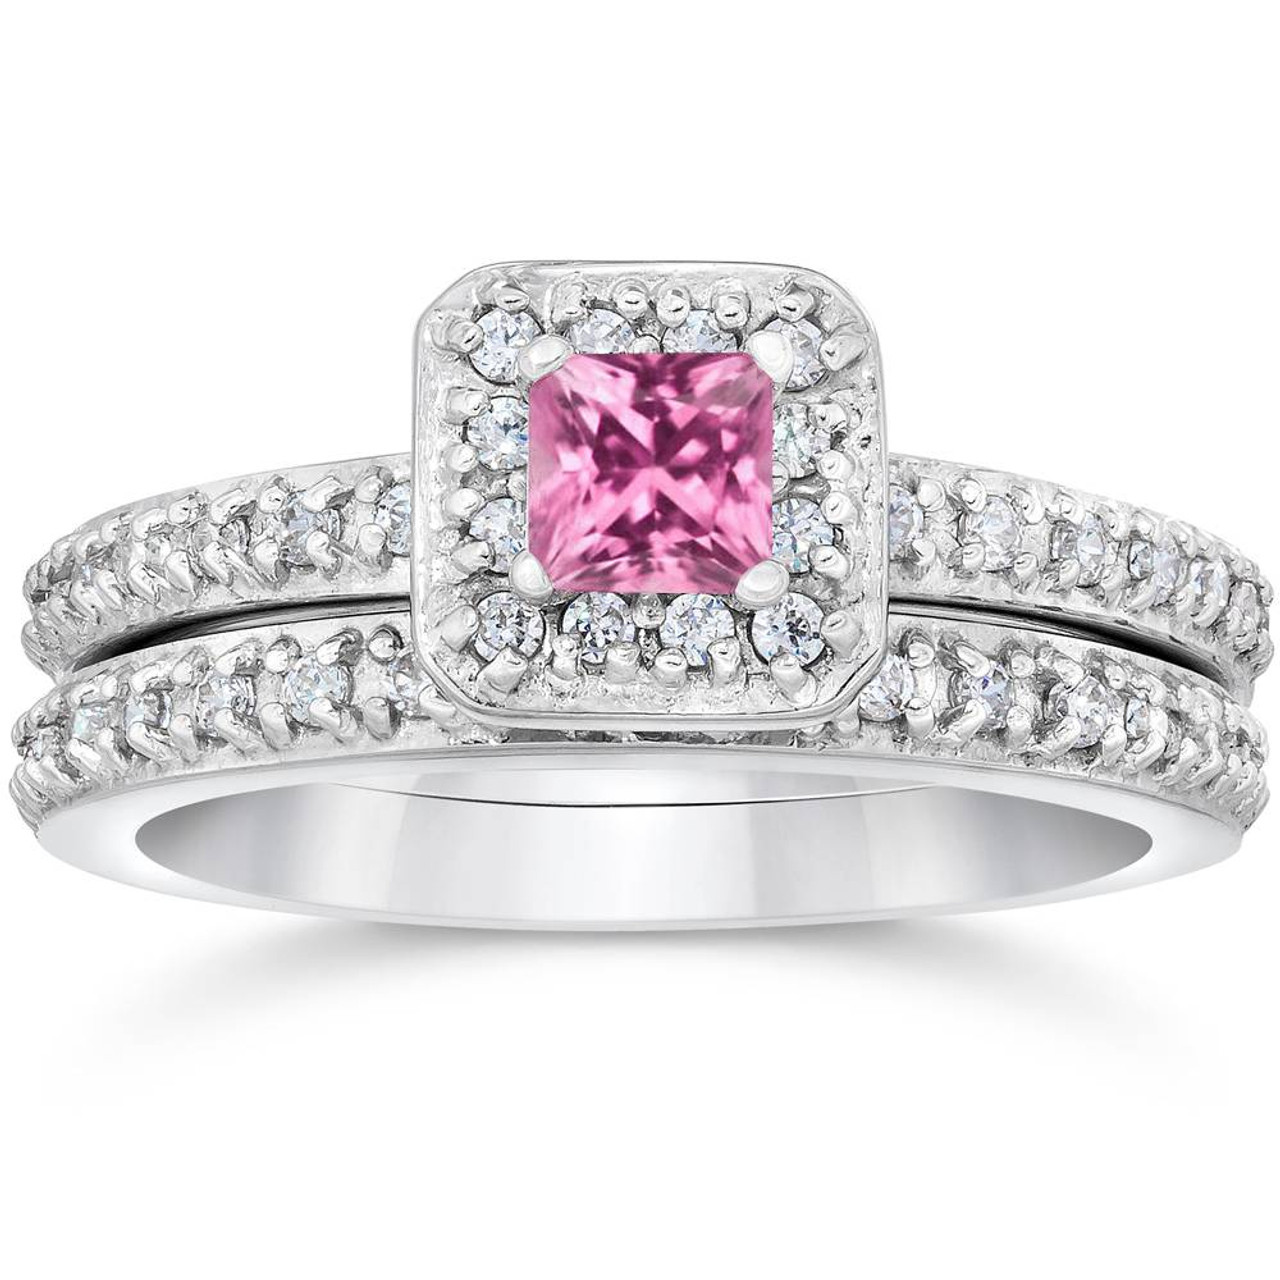 2d2147b94 ... Diamond Ring Set 14K White Gold (G/H, I1). ENG0373Pink. 2 Reviews  https://d3d71ba2asa5oz.cloudfront.net/53000589/images/eng0373pinkxlarge.